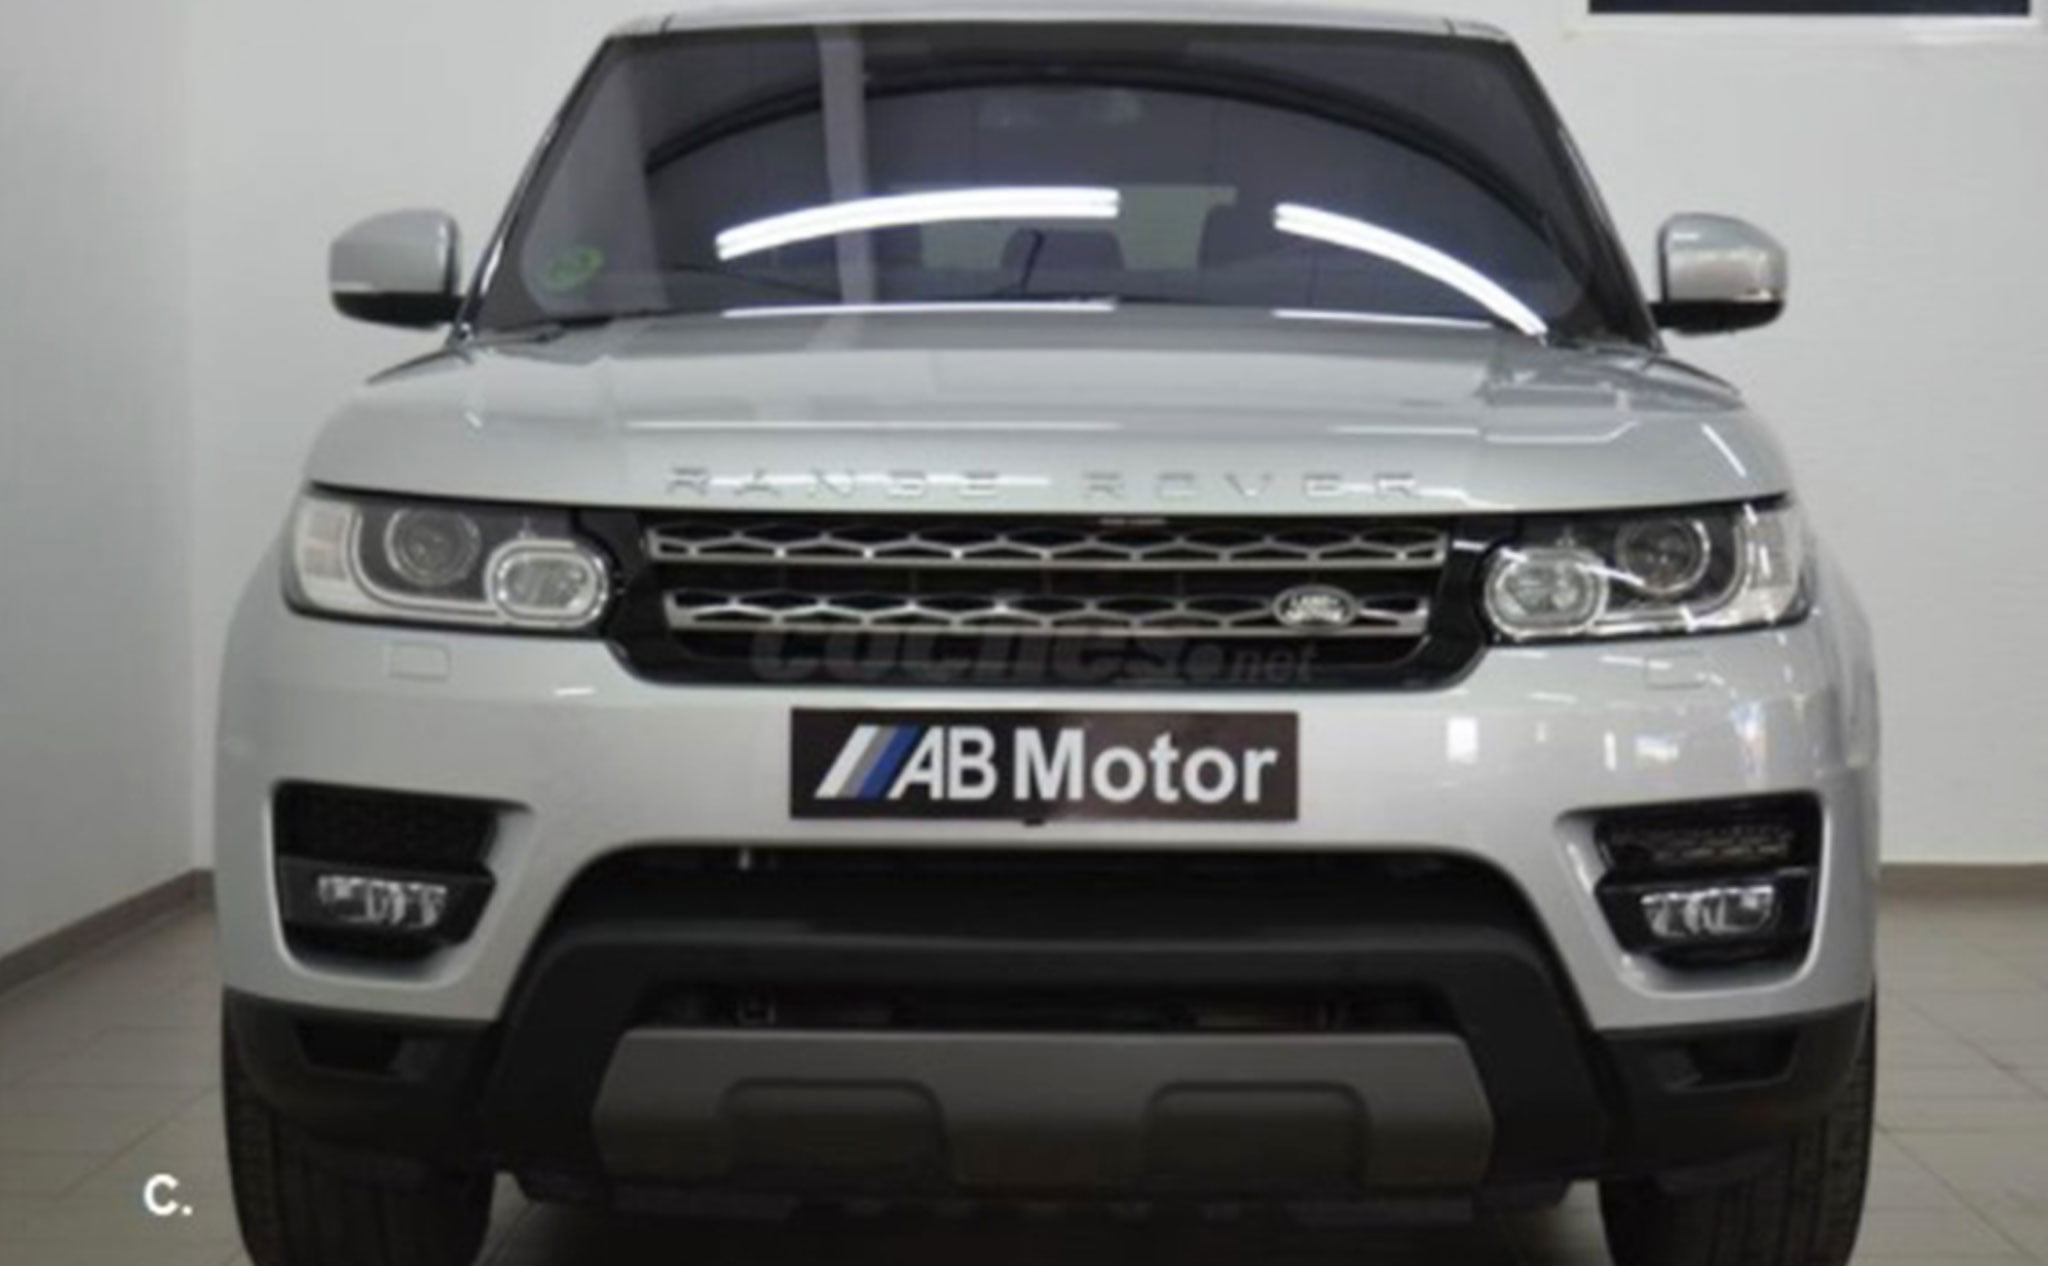 Land Rover Range Rover Sport – AB Motor